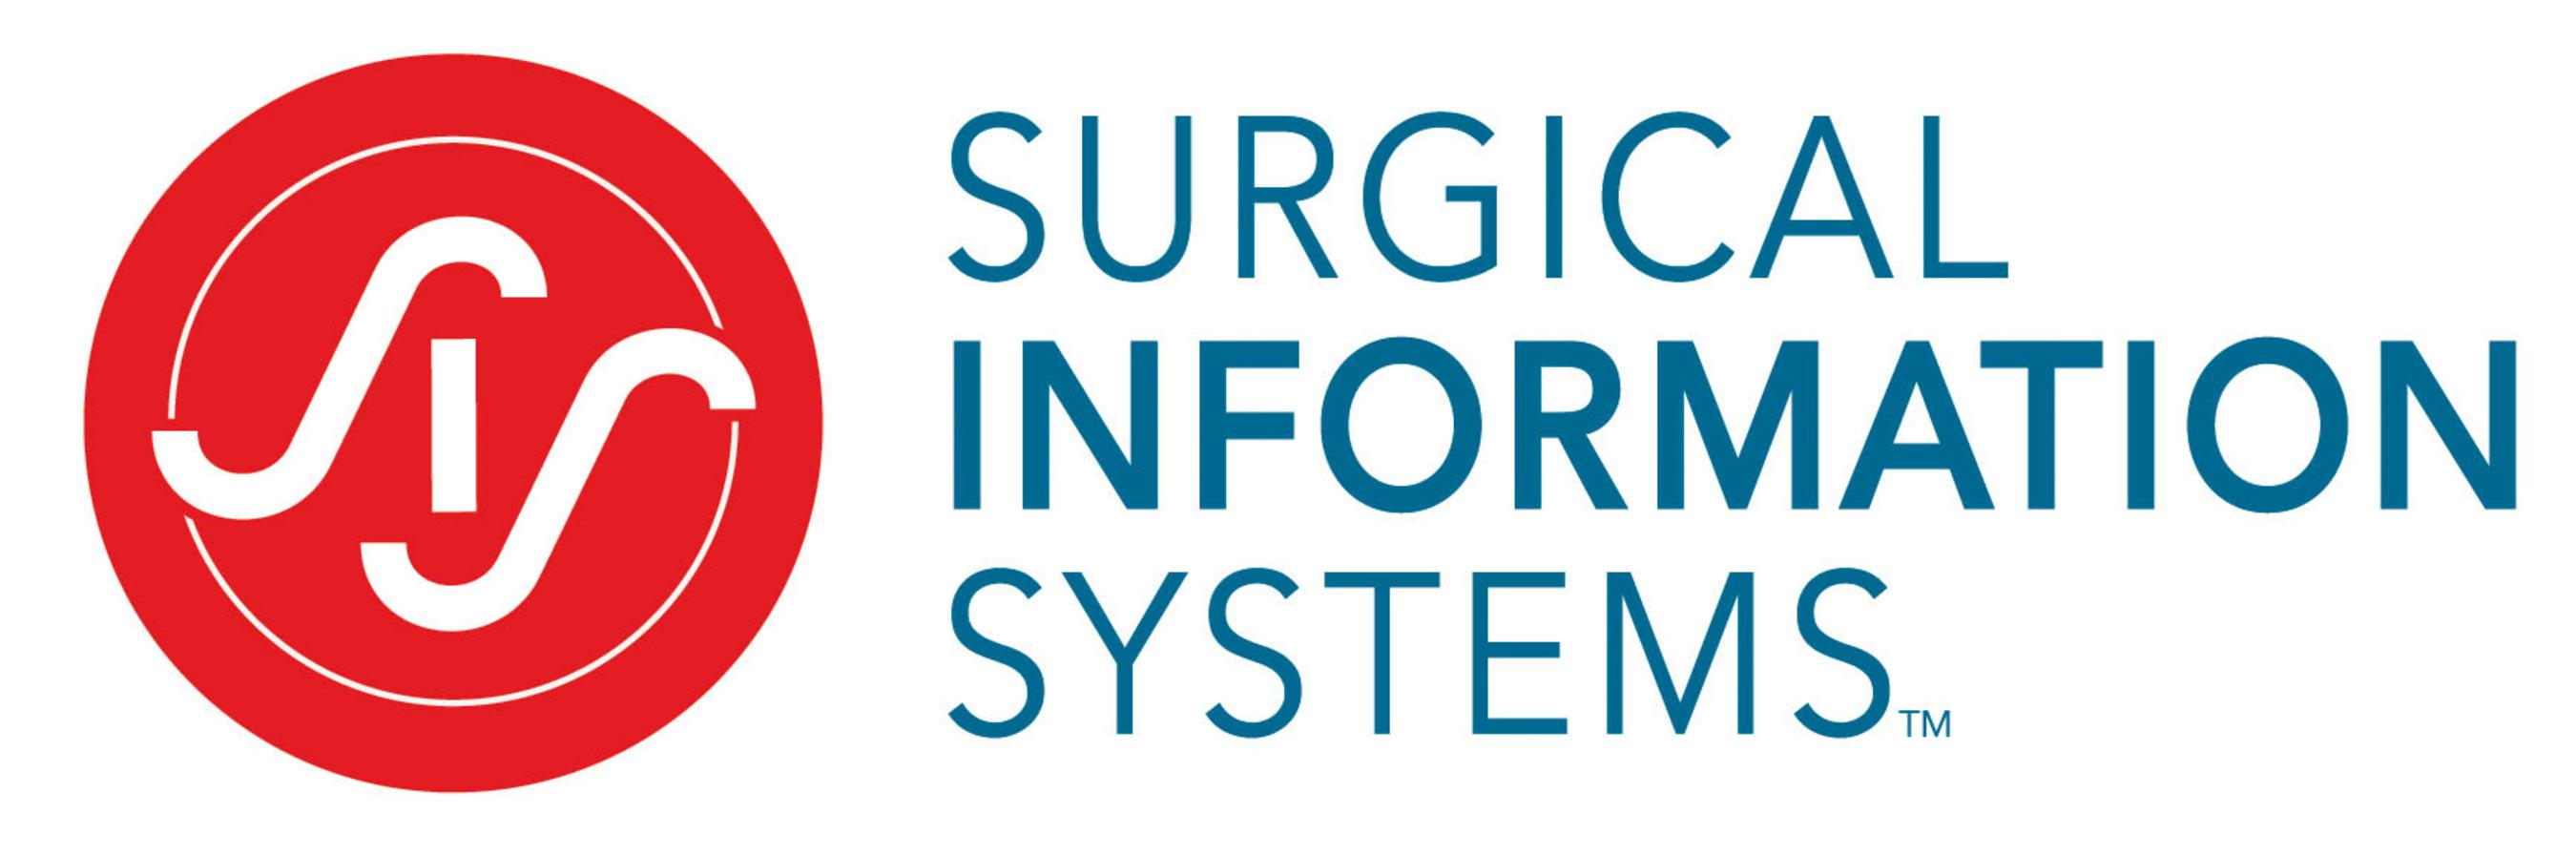 Surgical Information Systems LOGO. (PRNewsFoto/Surgical Information Systems) (PRNewsFoto/)